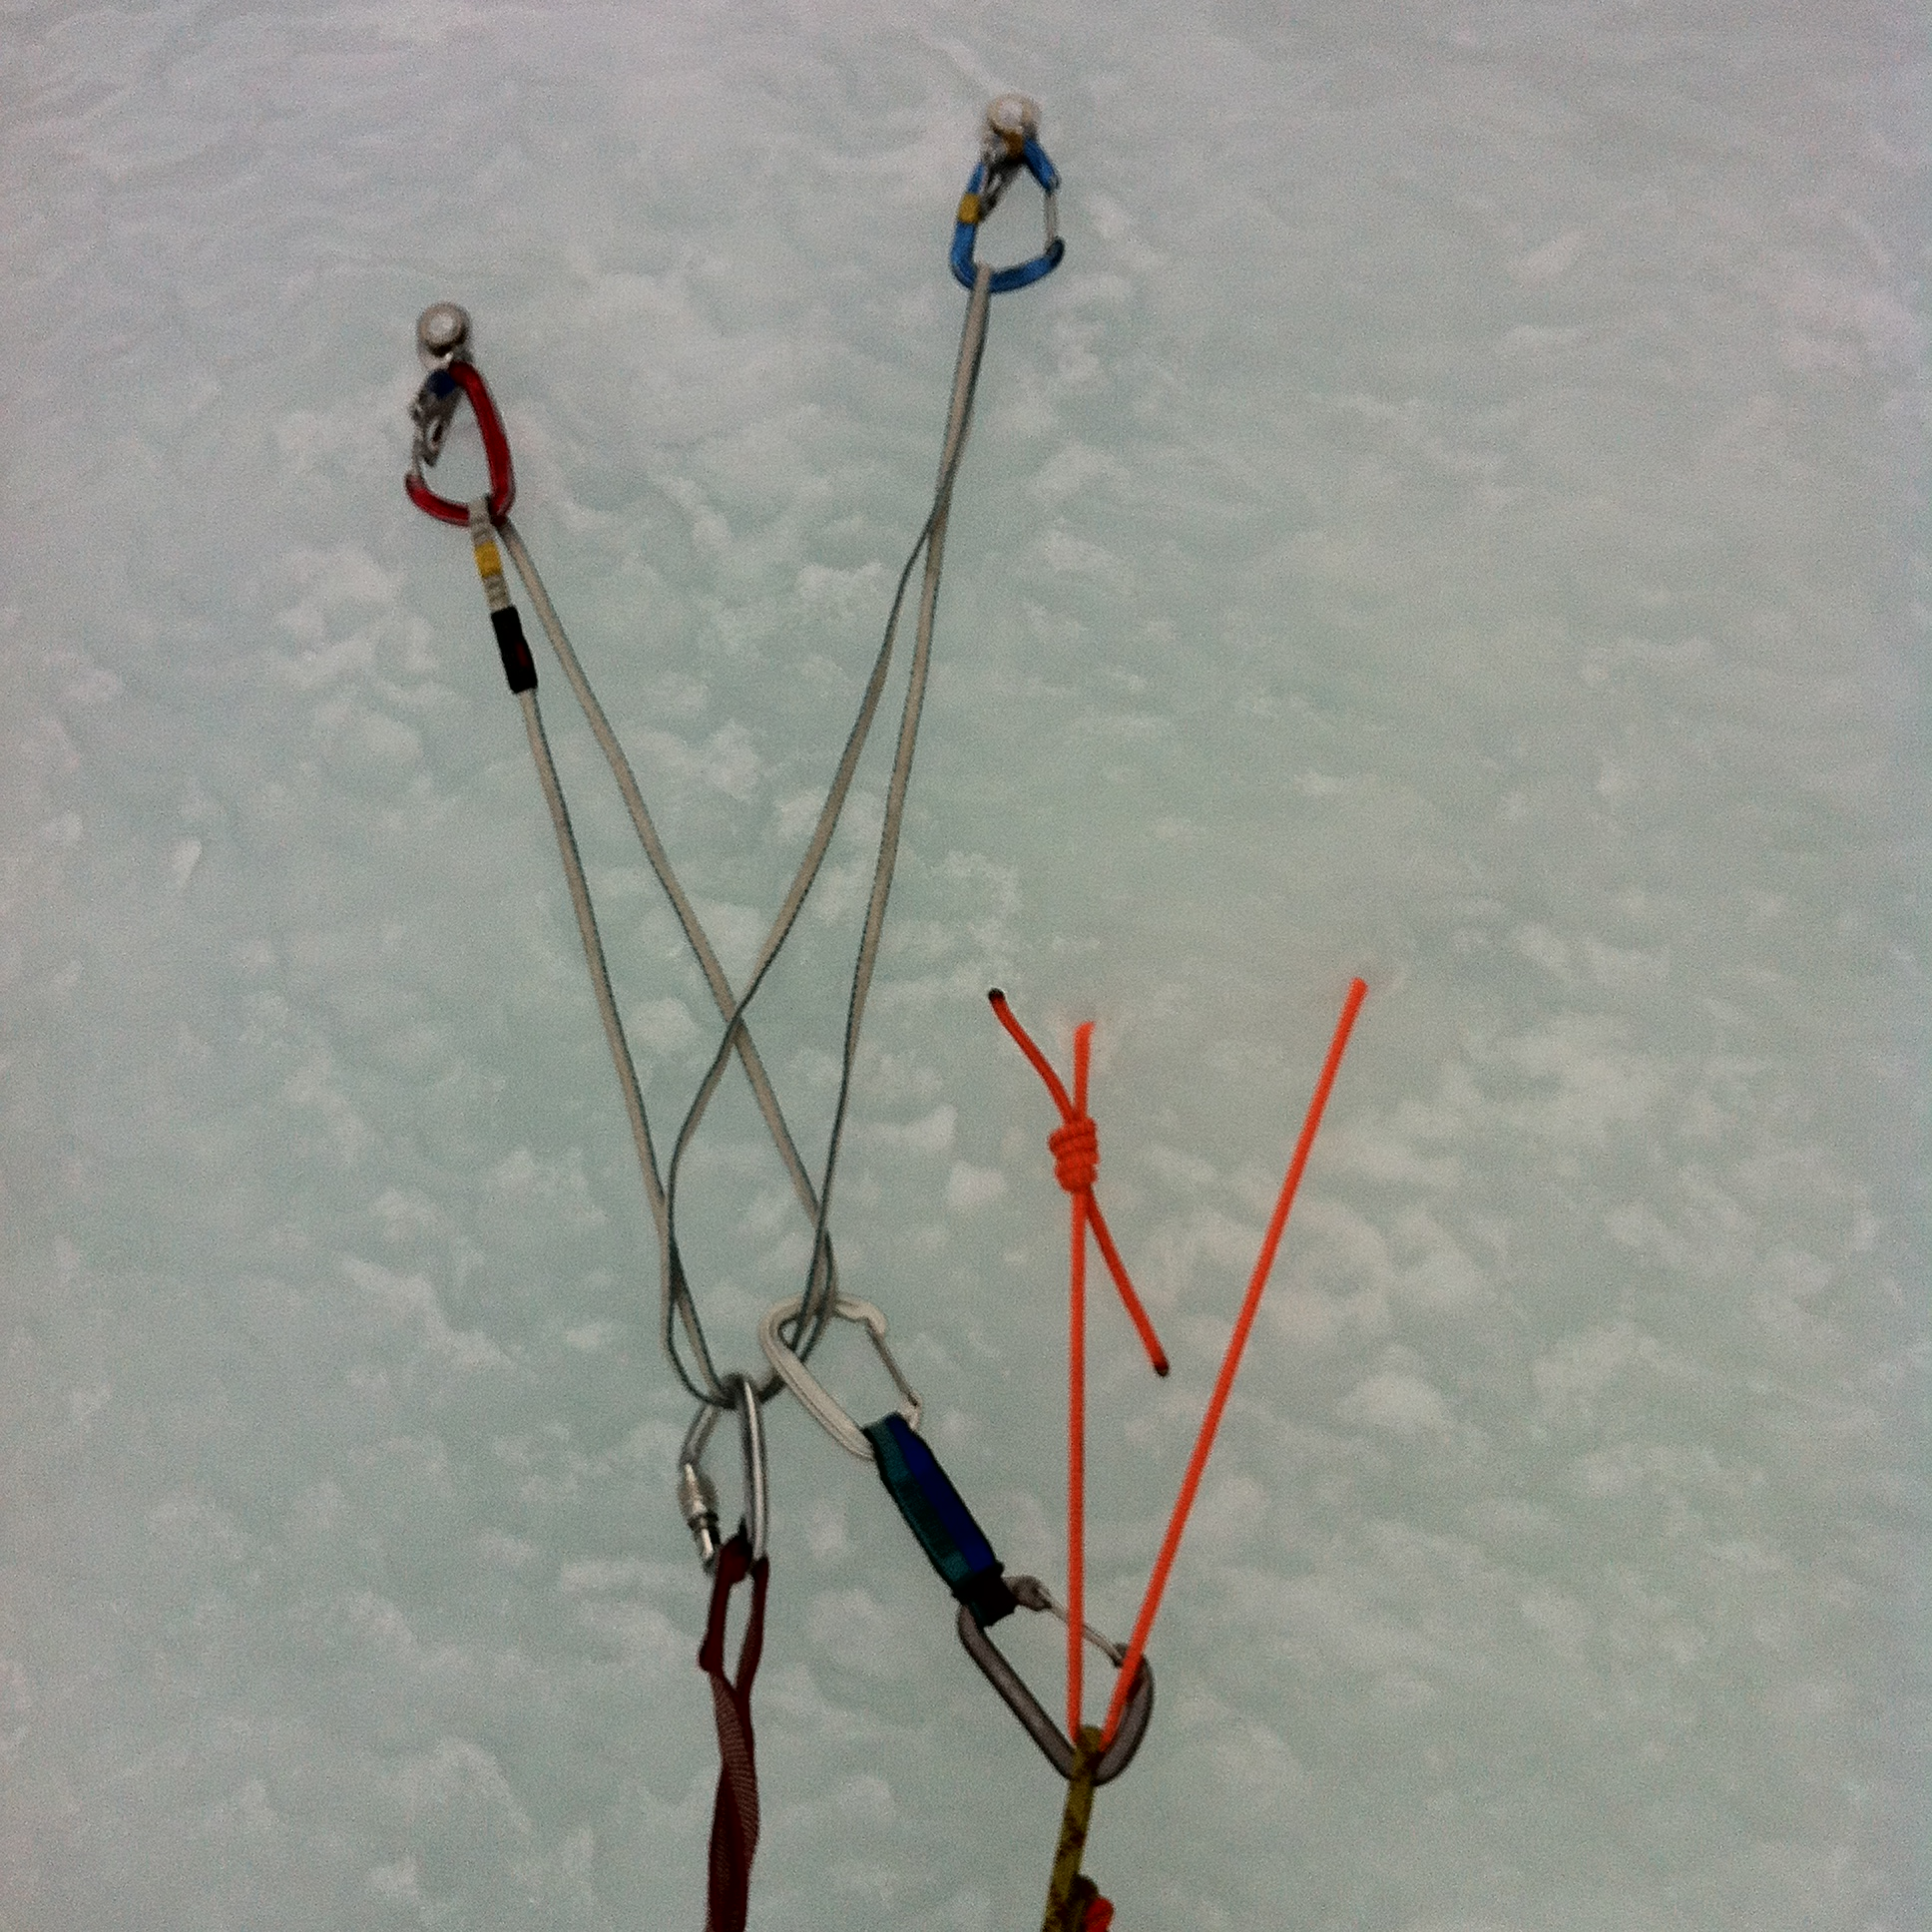 Rockies Ice Specialists Tip Of The Week Rockies Ice Com